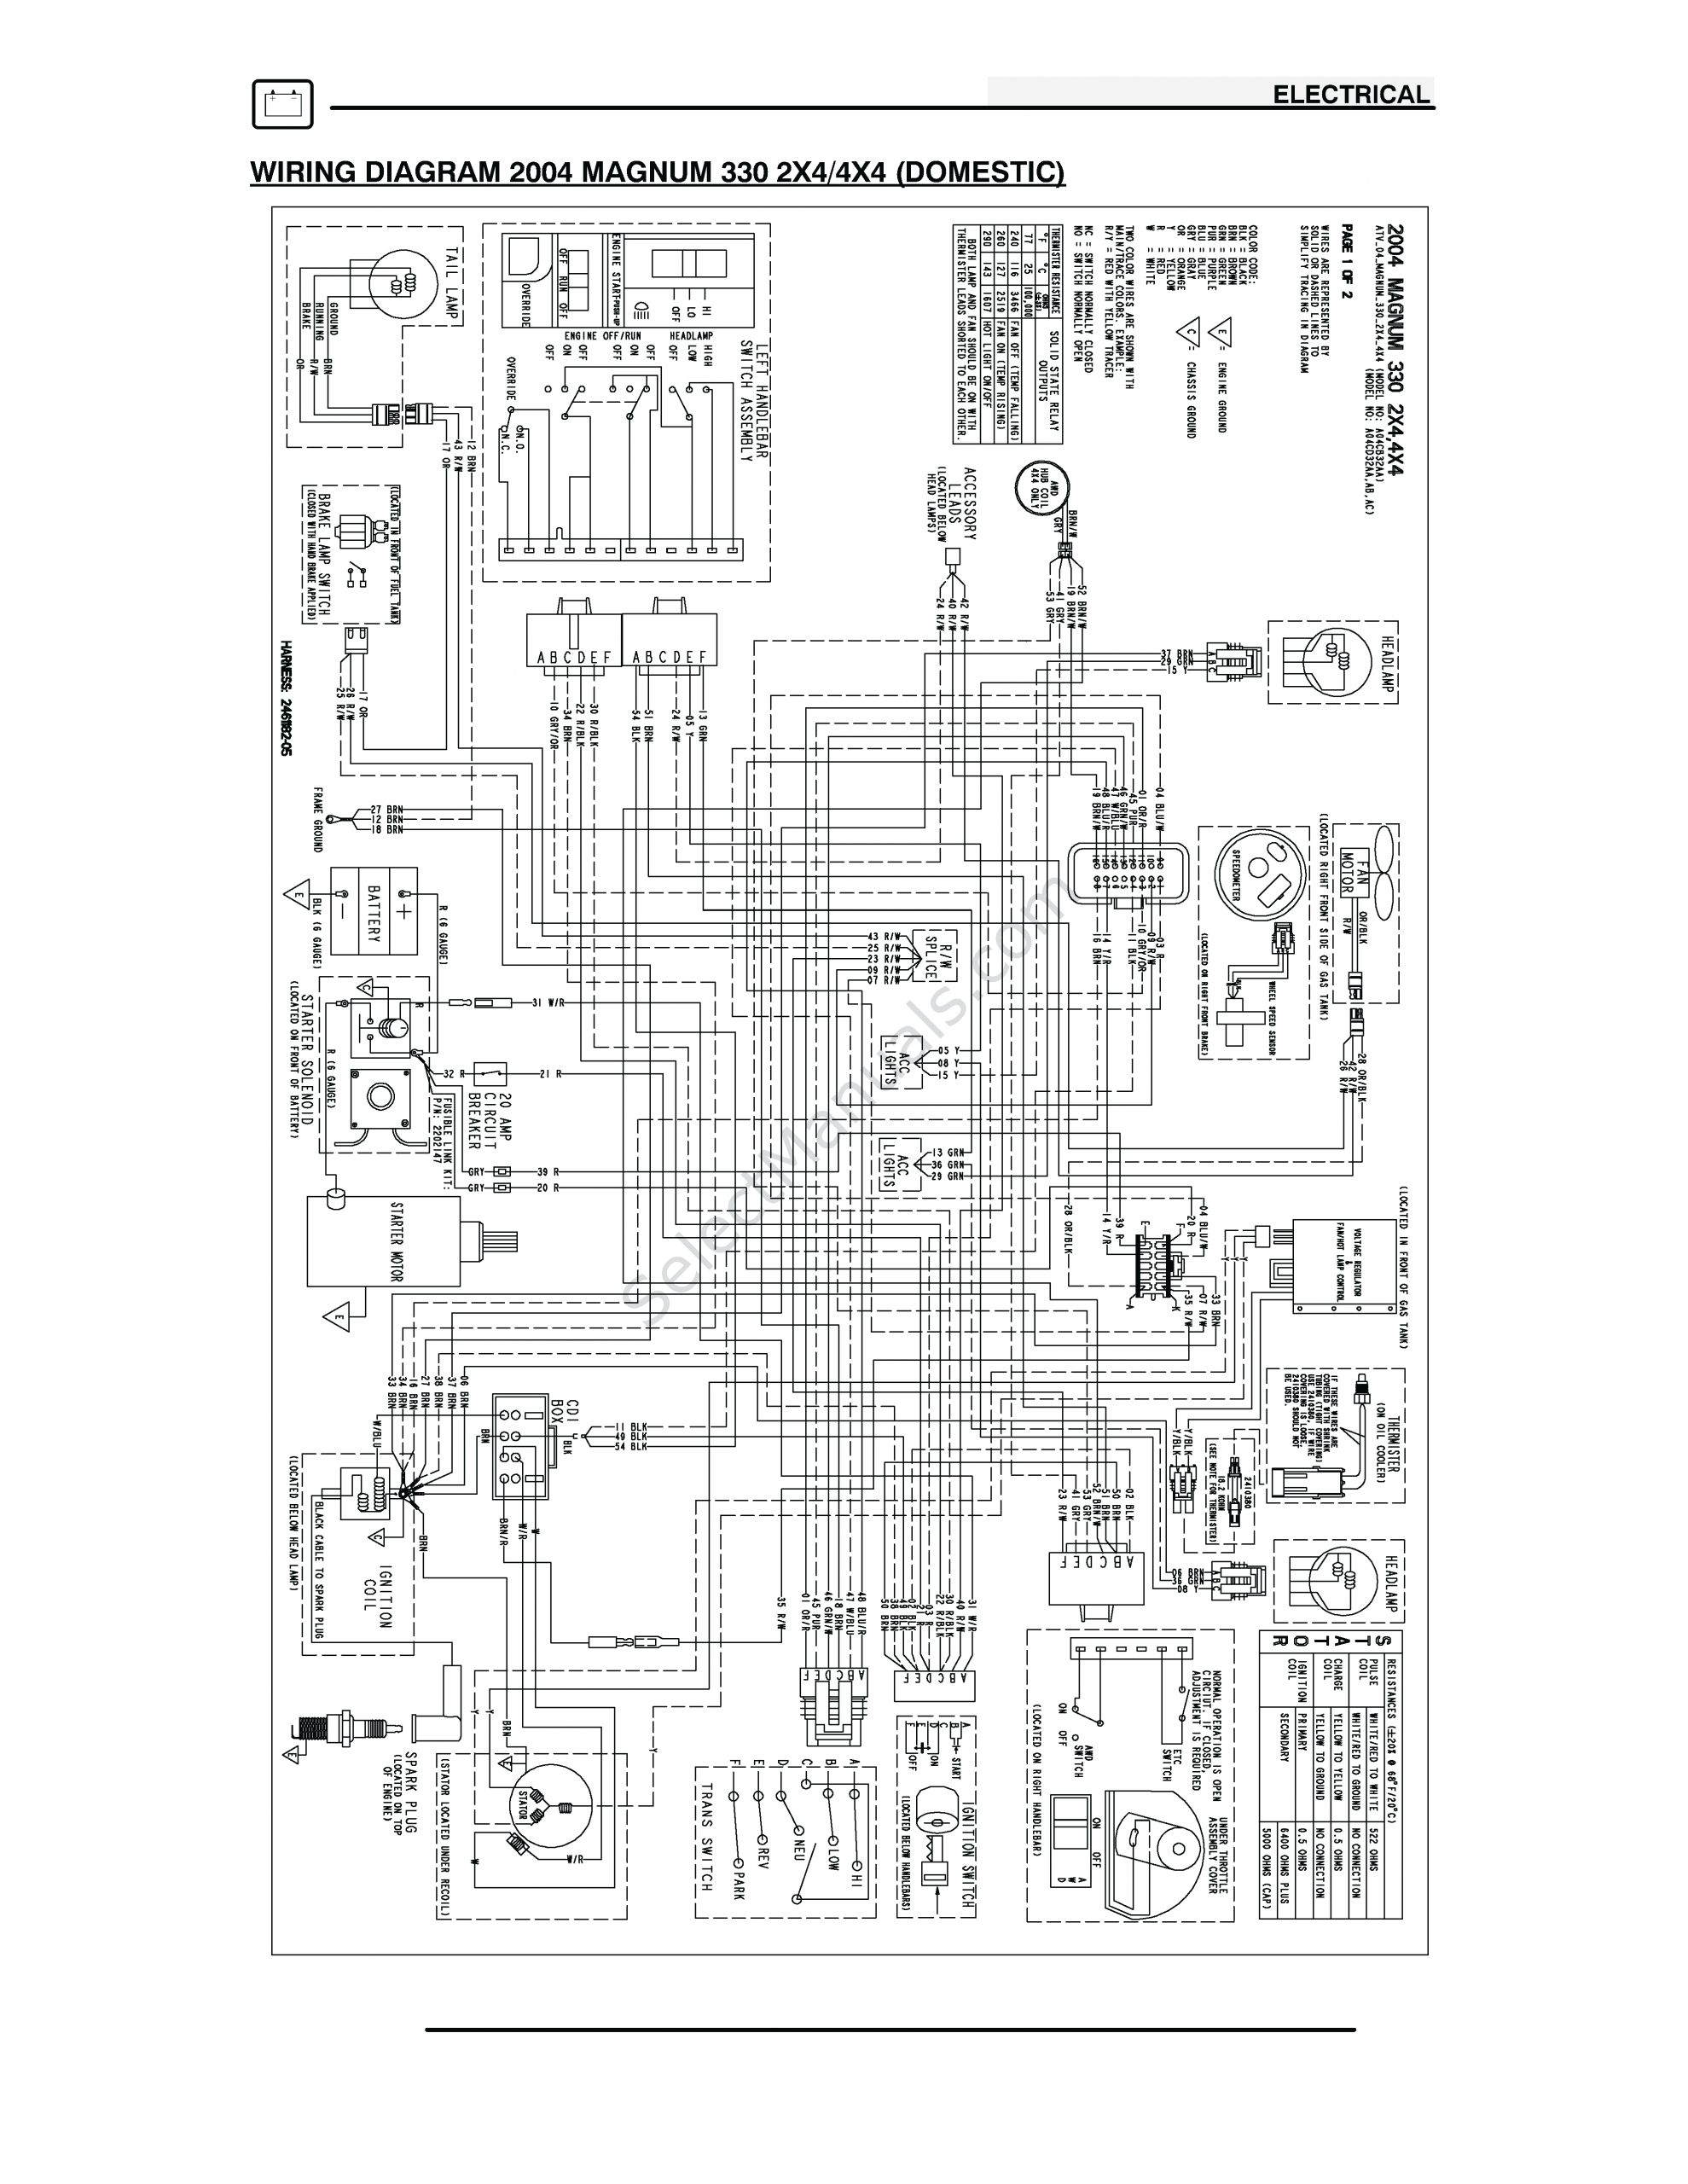 DIAGRAM] Road Boss Trailer Wiring Diagram FULL Version HD Quality Wiring  Diagram - FYIDATABASE.EMILIENGIRAULT.FRDatabase diagramming tool - emiliengirault.fr